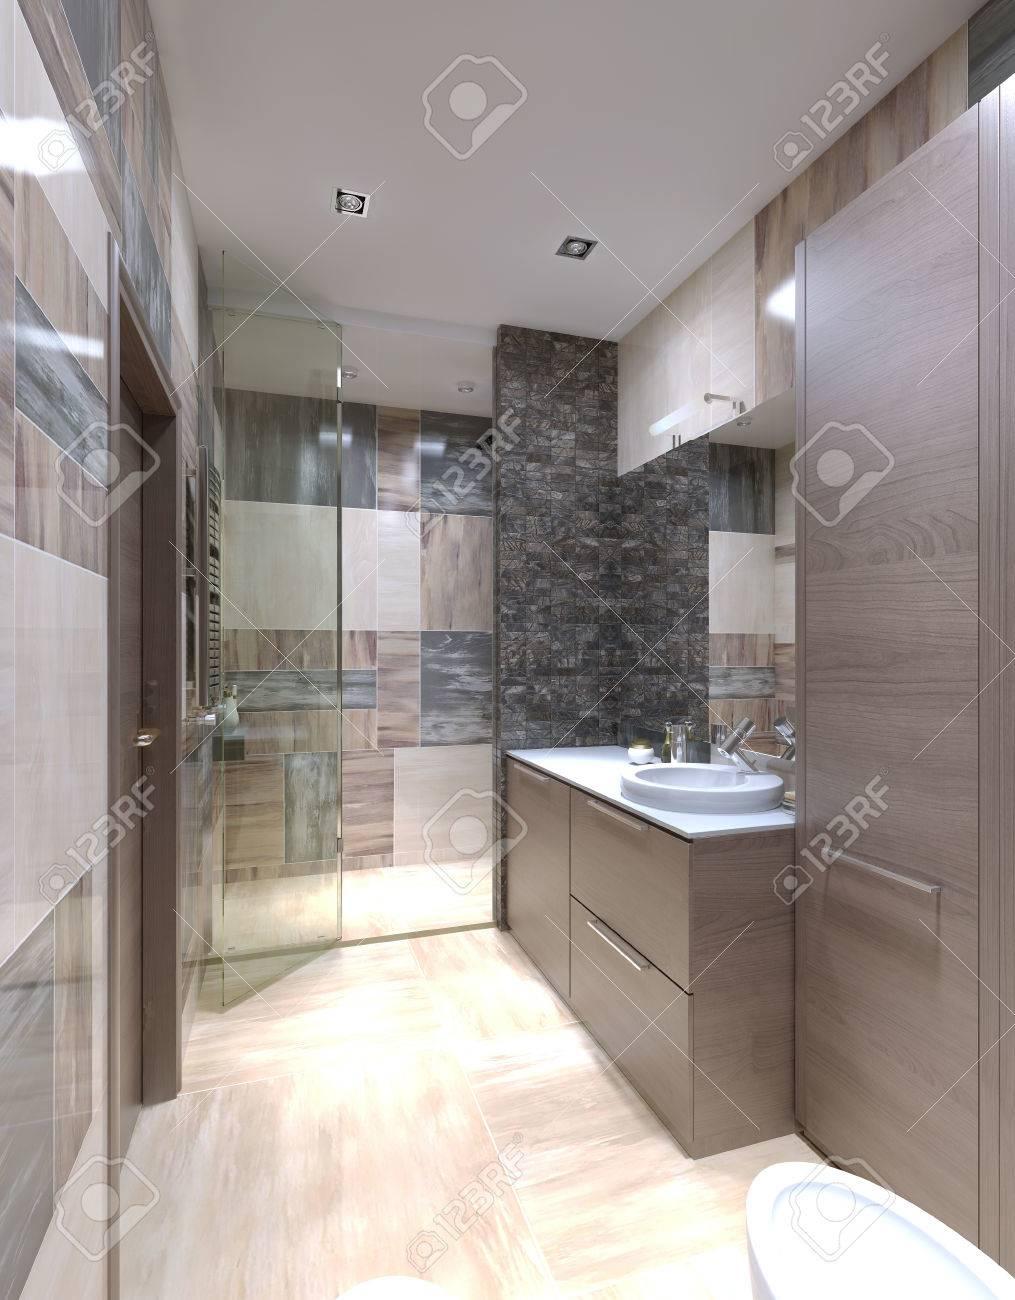 Badezimmer Modern Mixed Ziegel Wande Hellbraune Mobel Schrank Mit